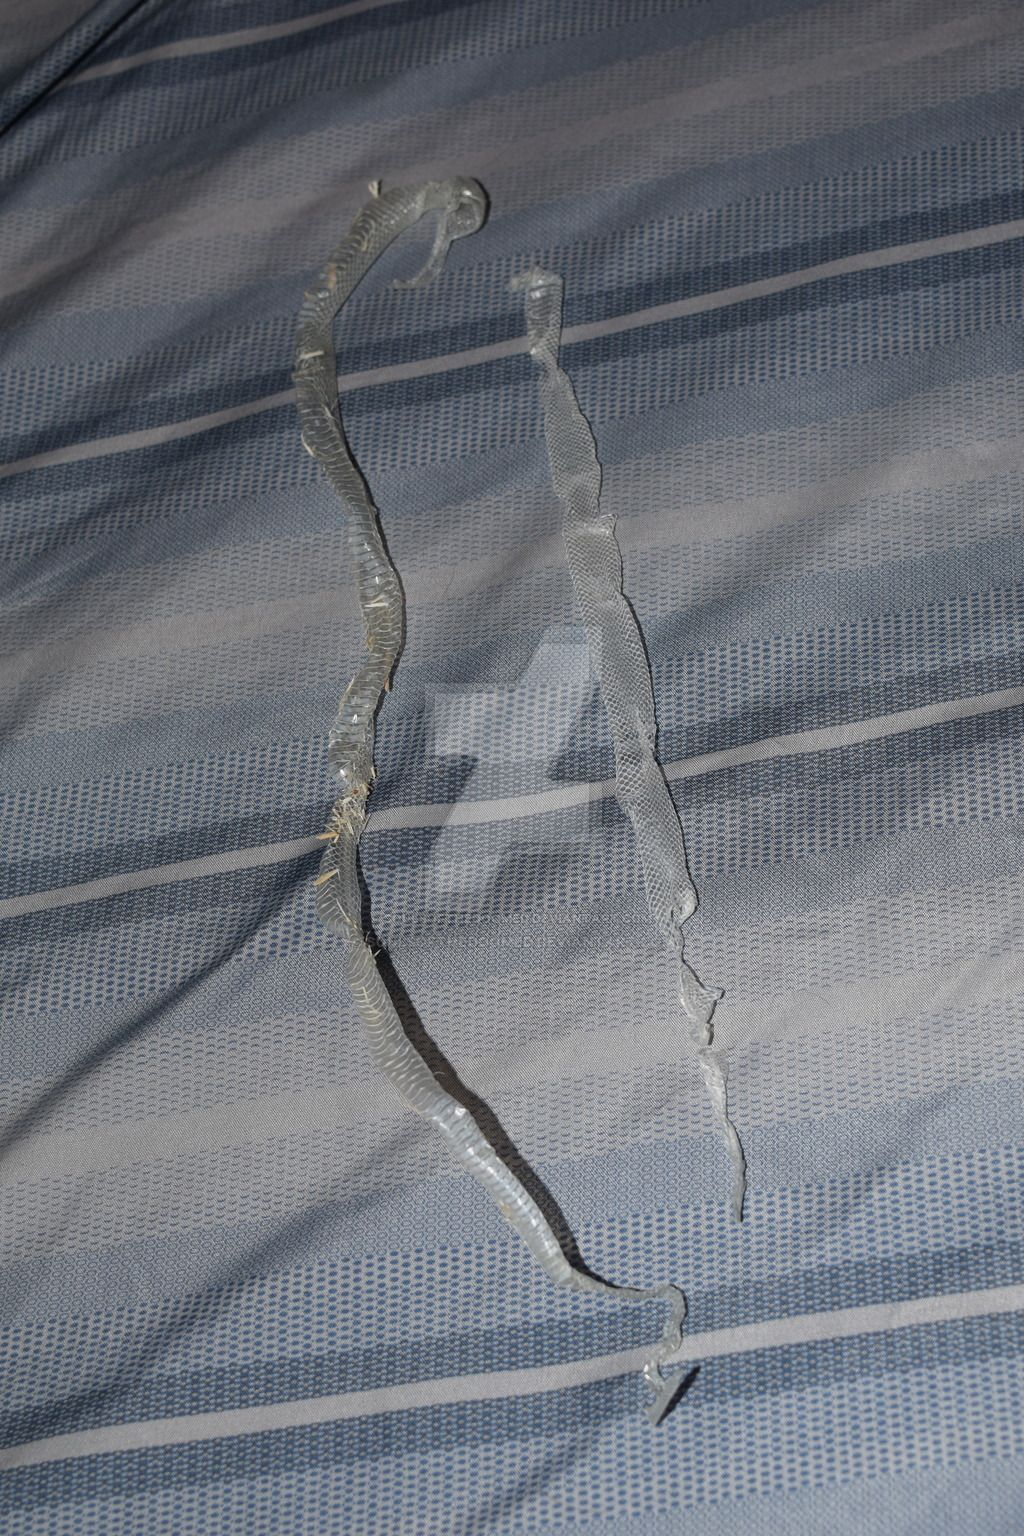 Snake Skin by SoulsofTheDoomed